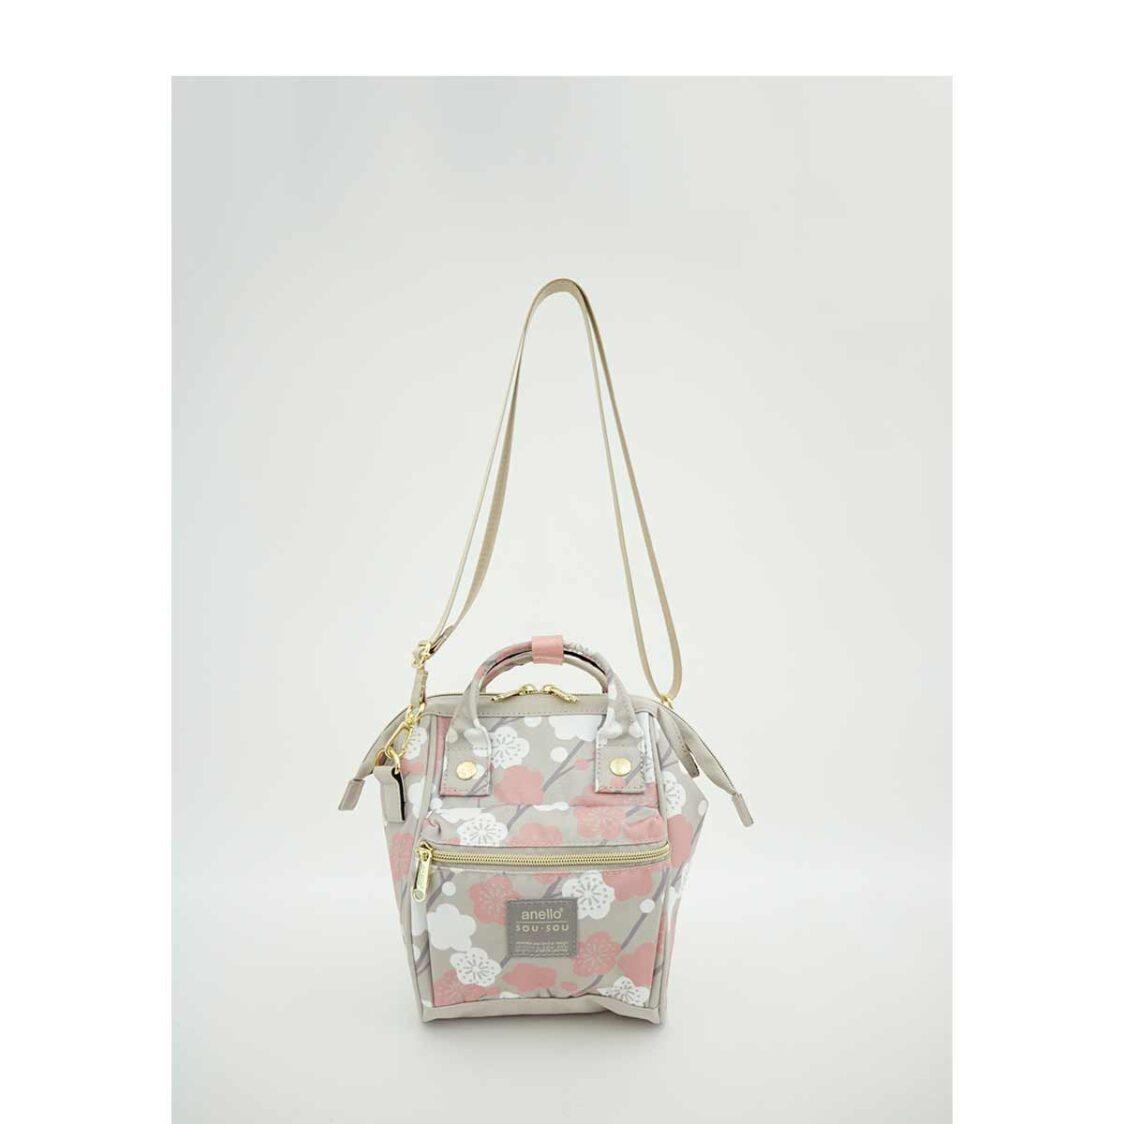 Anello X Sousou 2Way Micro Shoulder Bag Light Beige